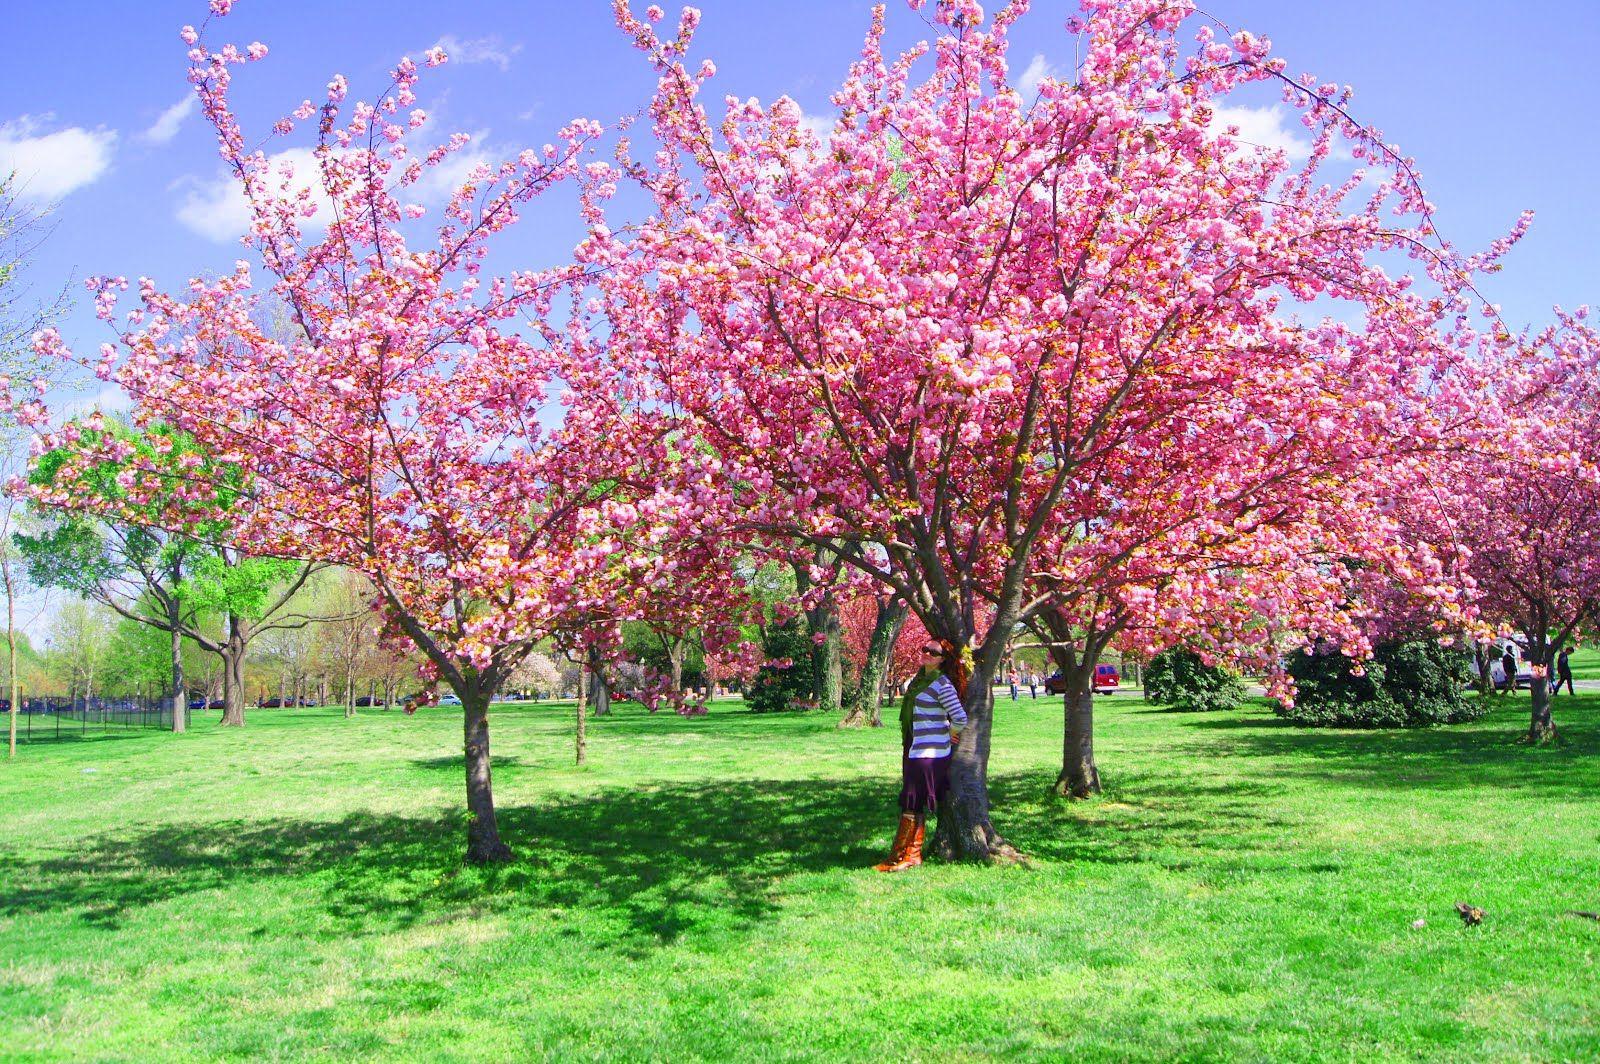 Pin By Shelley Boland On V Day Hd Cherry Blossom Festival Blossom Blossom Trees